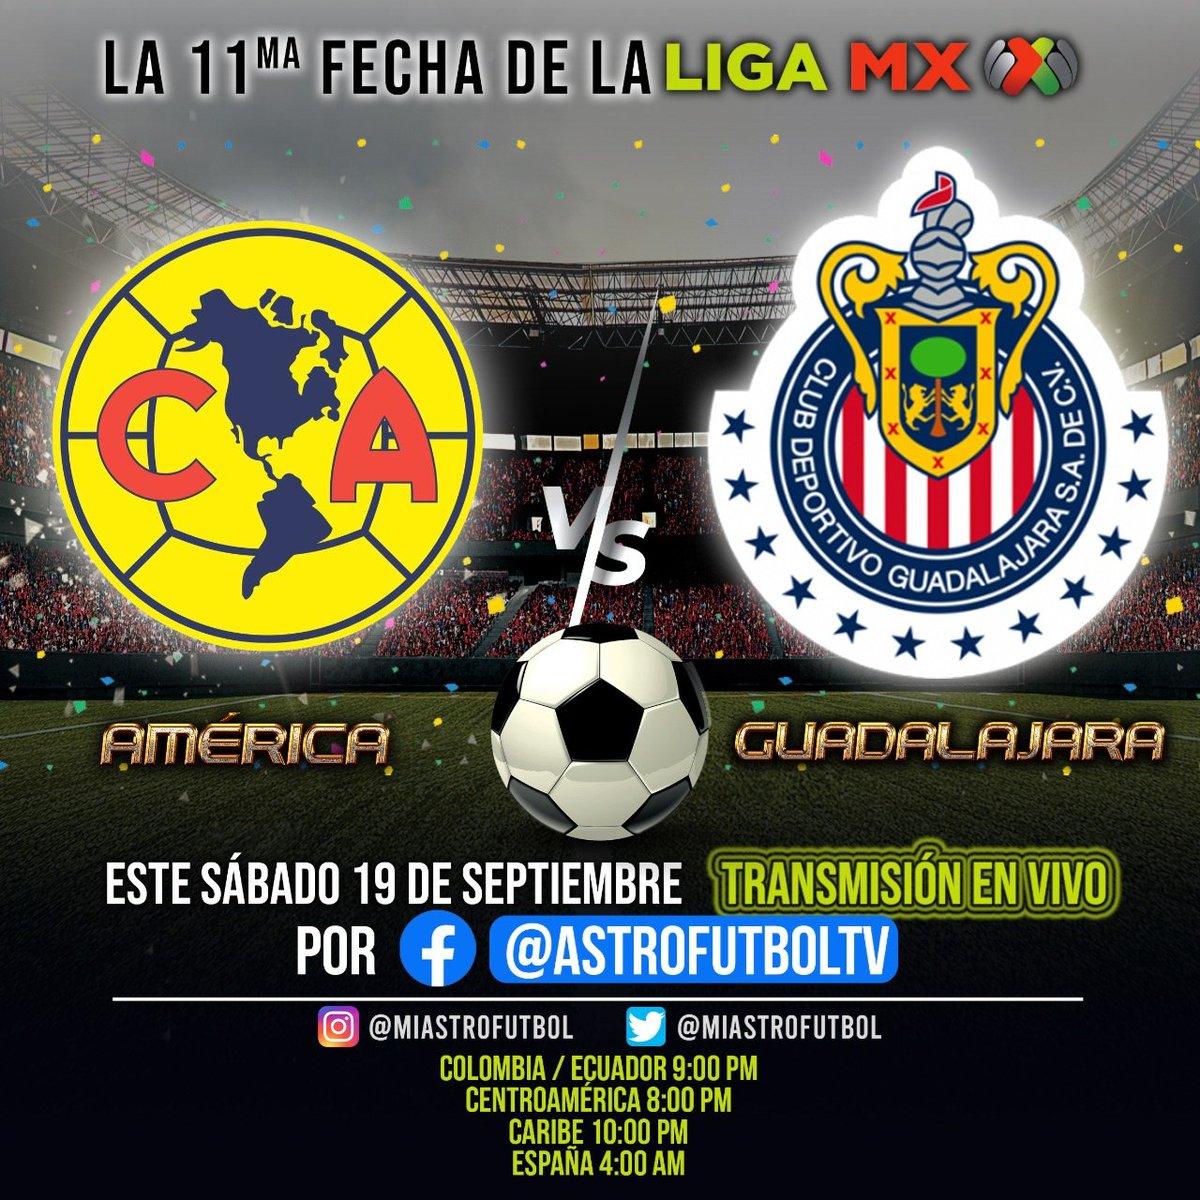 Hoy nuevamente transmisión en vivo de @LigaBBVAMX @Chivas @ClubAmerica  #OhYeah  @pacheandrade @Kris_MoraCR @alexisnoticias @alejomunevar @DiarioExtraCR @footters @DeporteColumbia @multimedioscr @AmericanOutlet_ @NachitoTV @multimedioscr @albertlesan https://t.co/ILObp0e1Tp